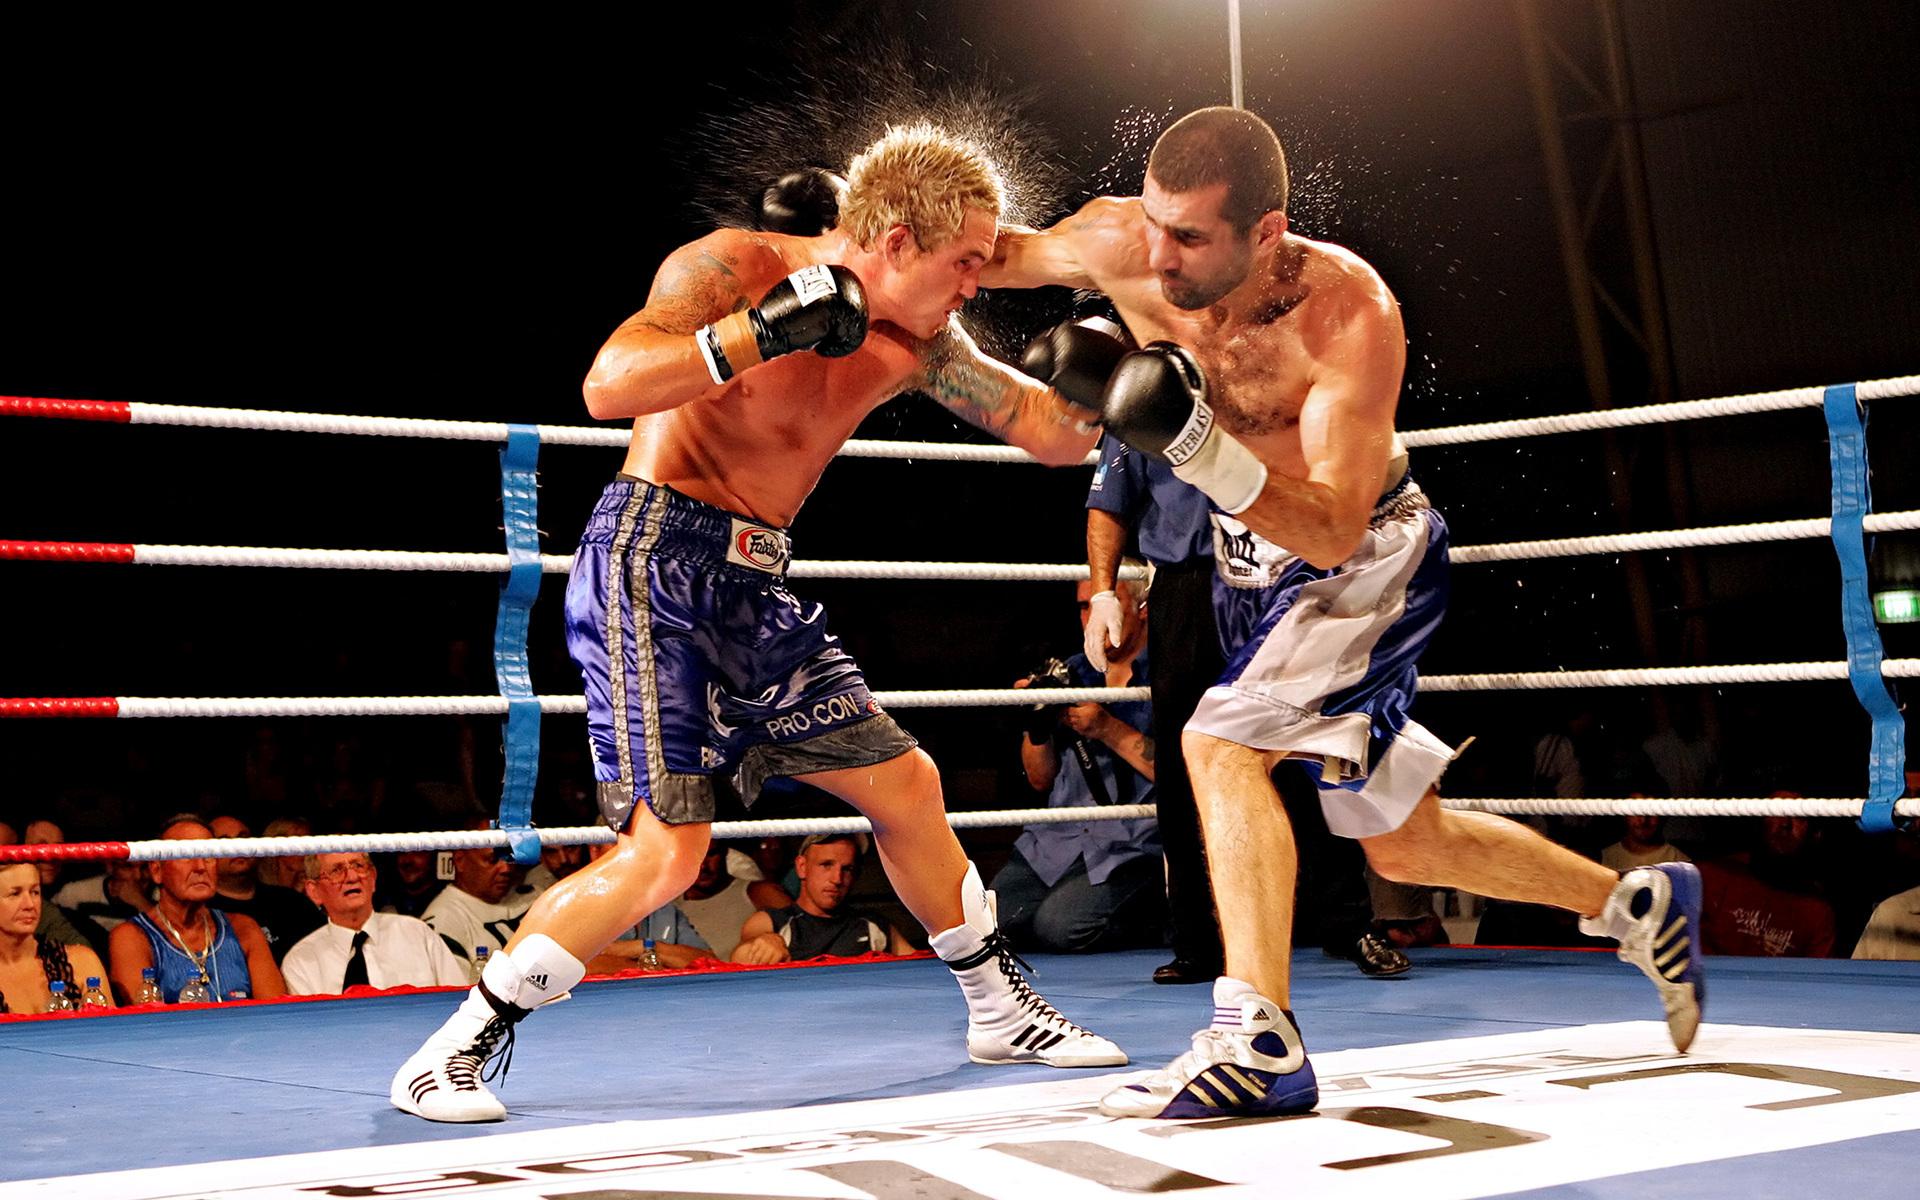 Характеристики классического бокса